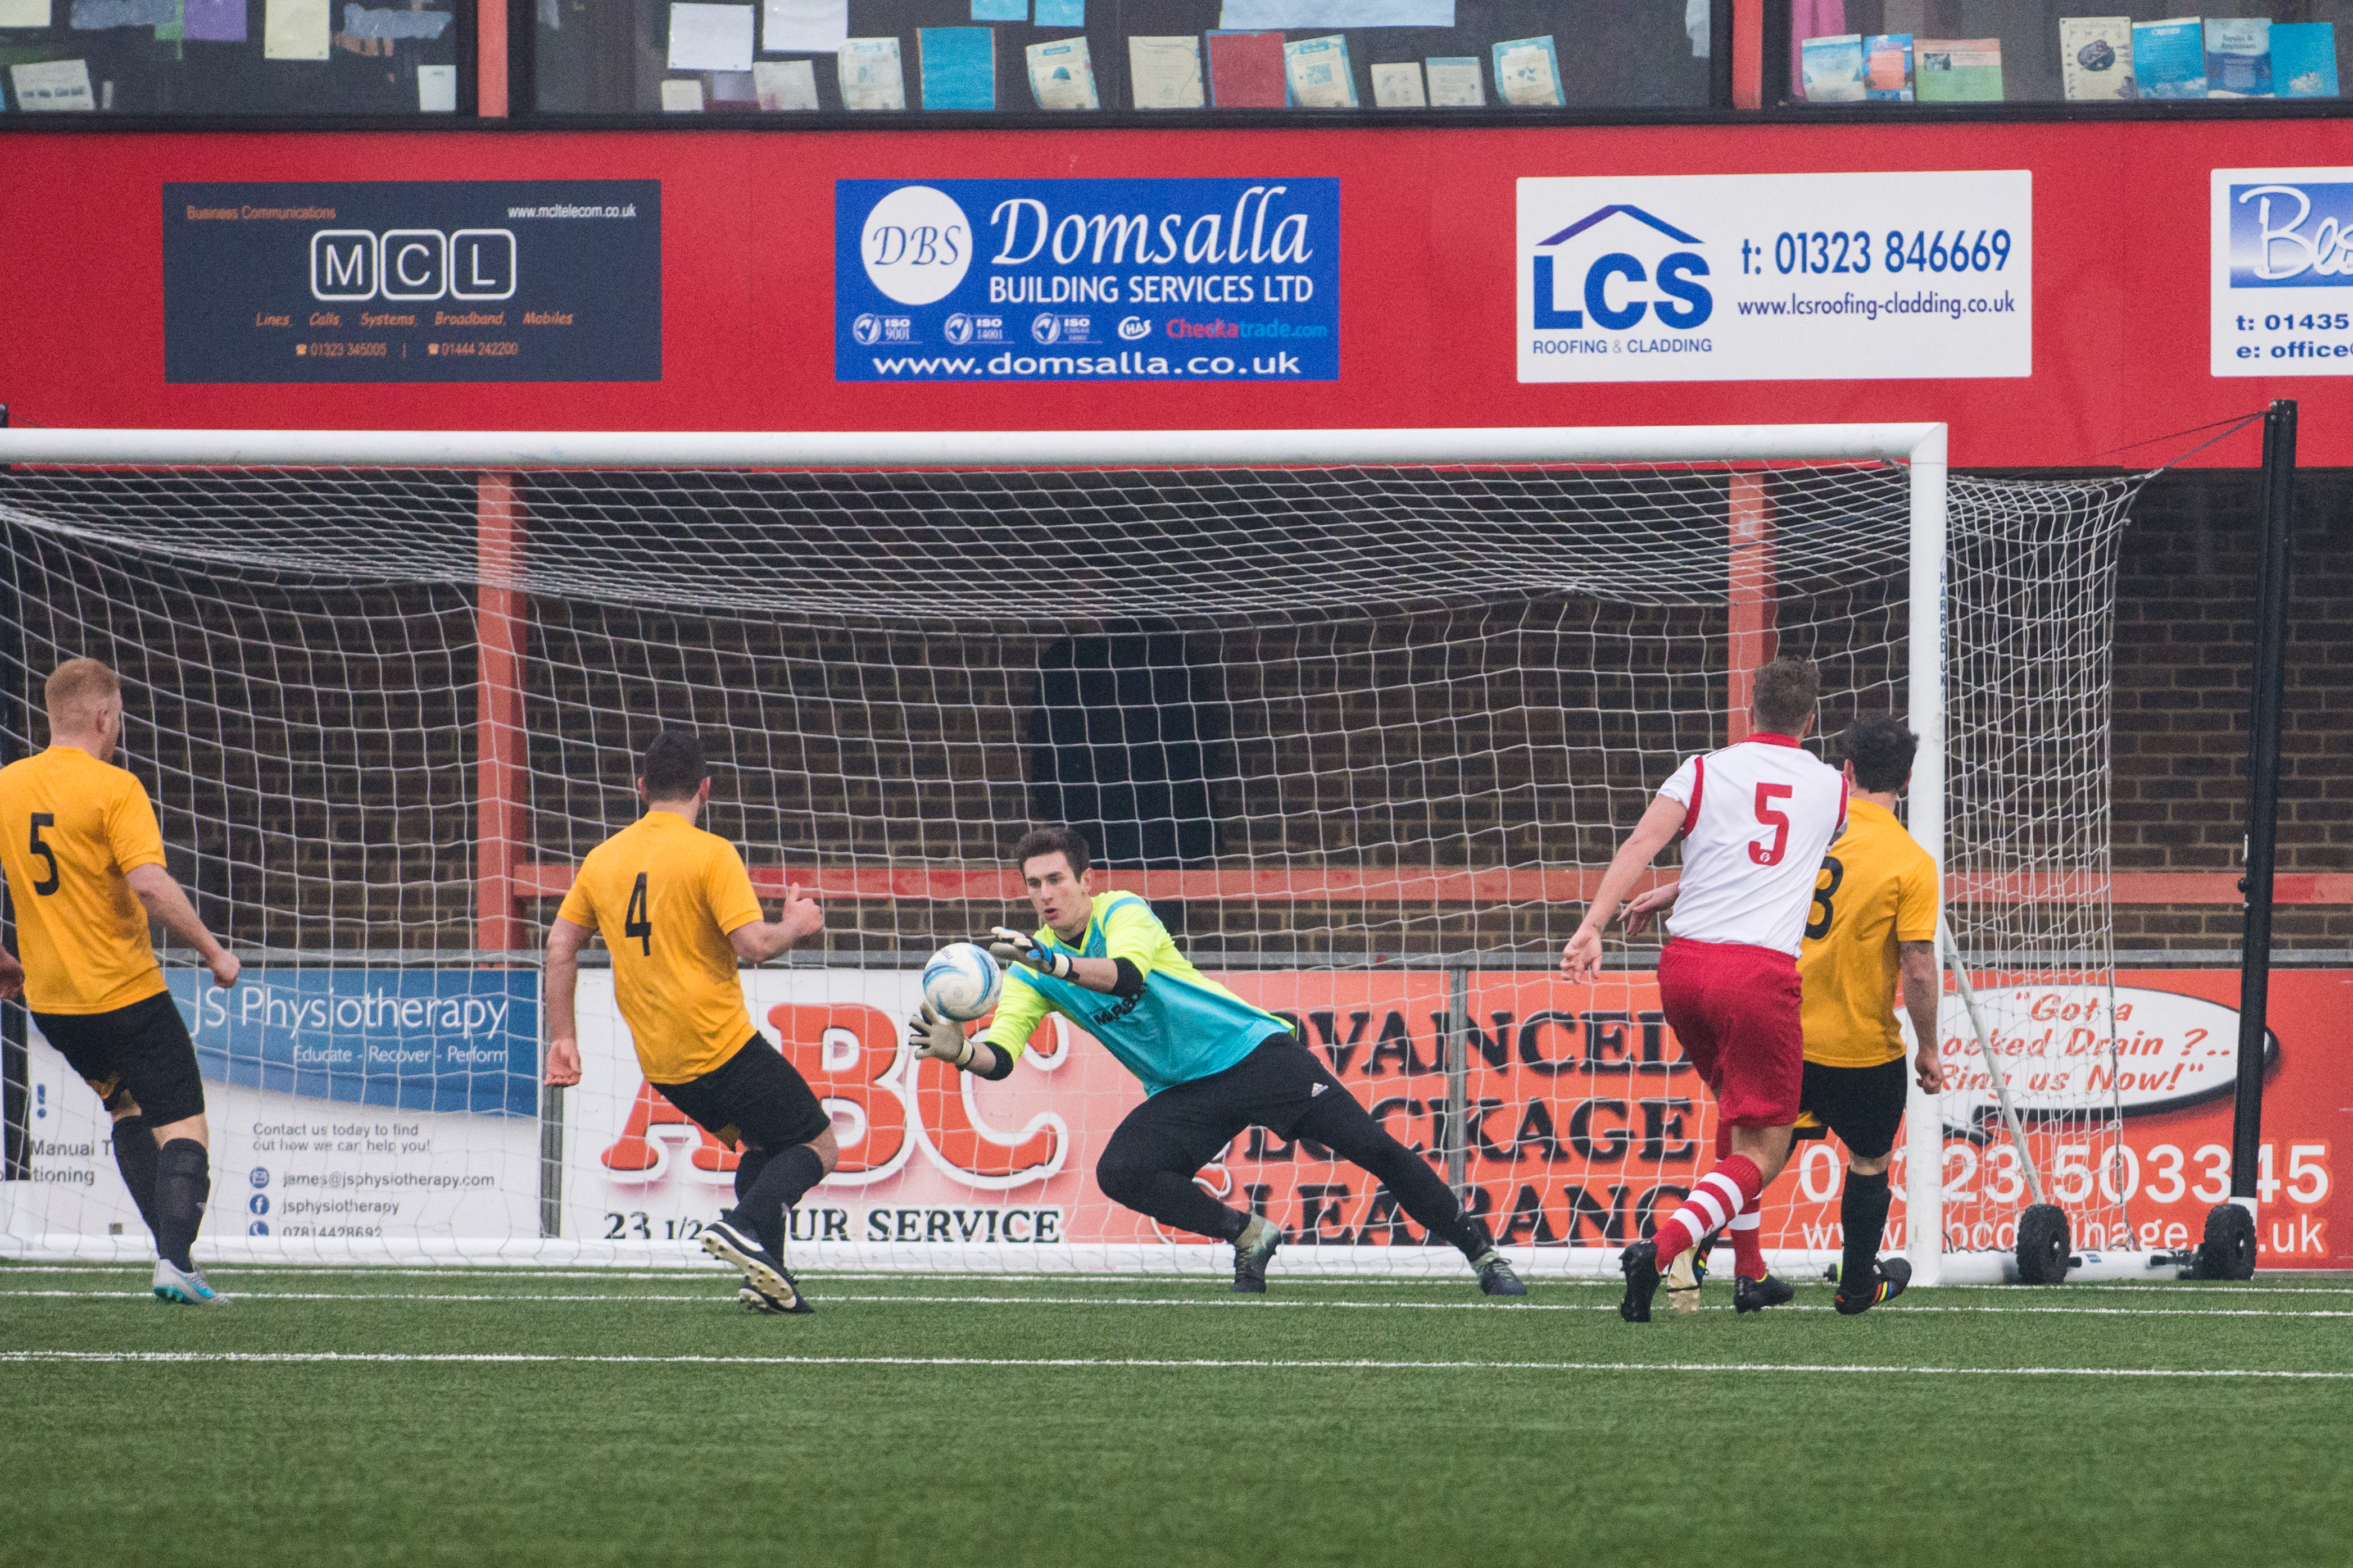 DAVID_JEFFERY Langney Wanderers FC vs Bexhill United FC 03.03.18 76